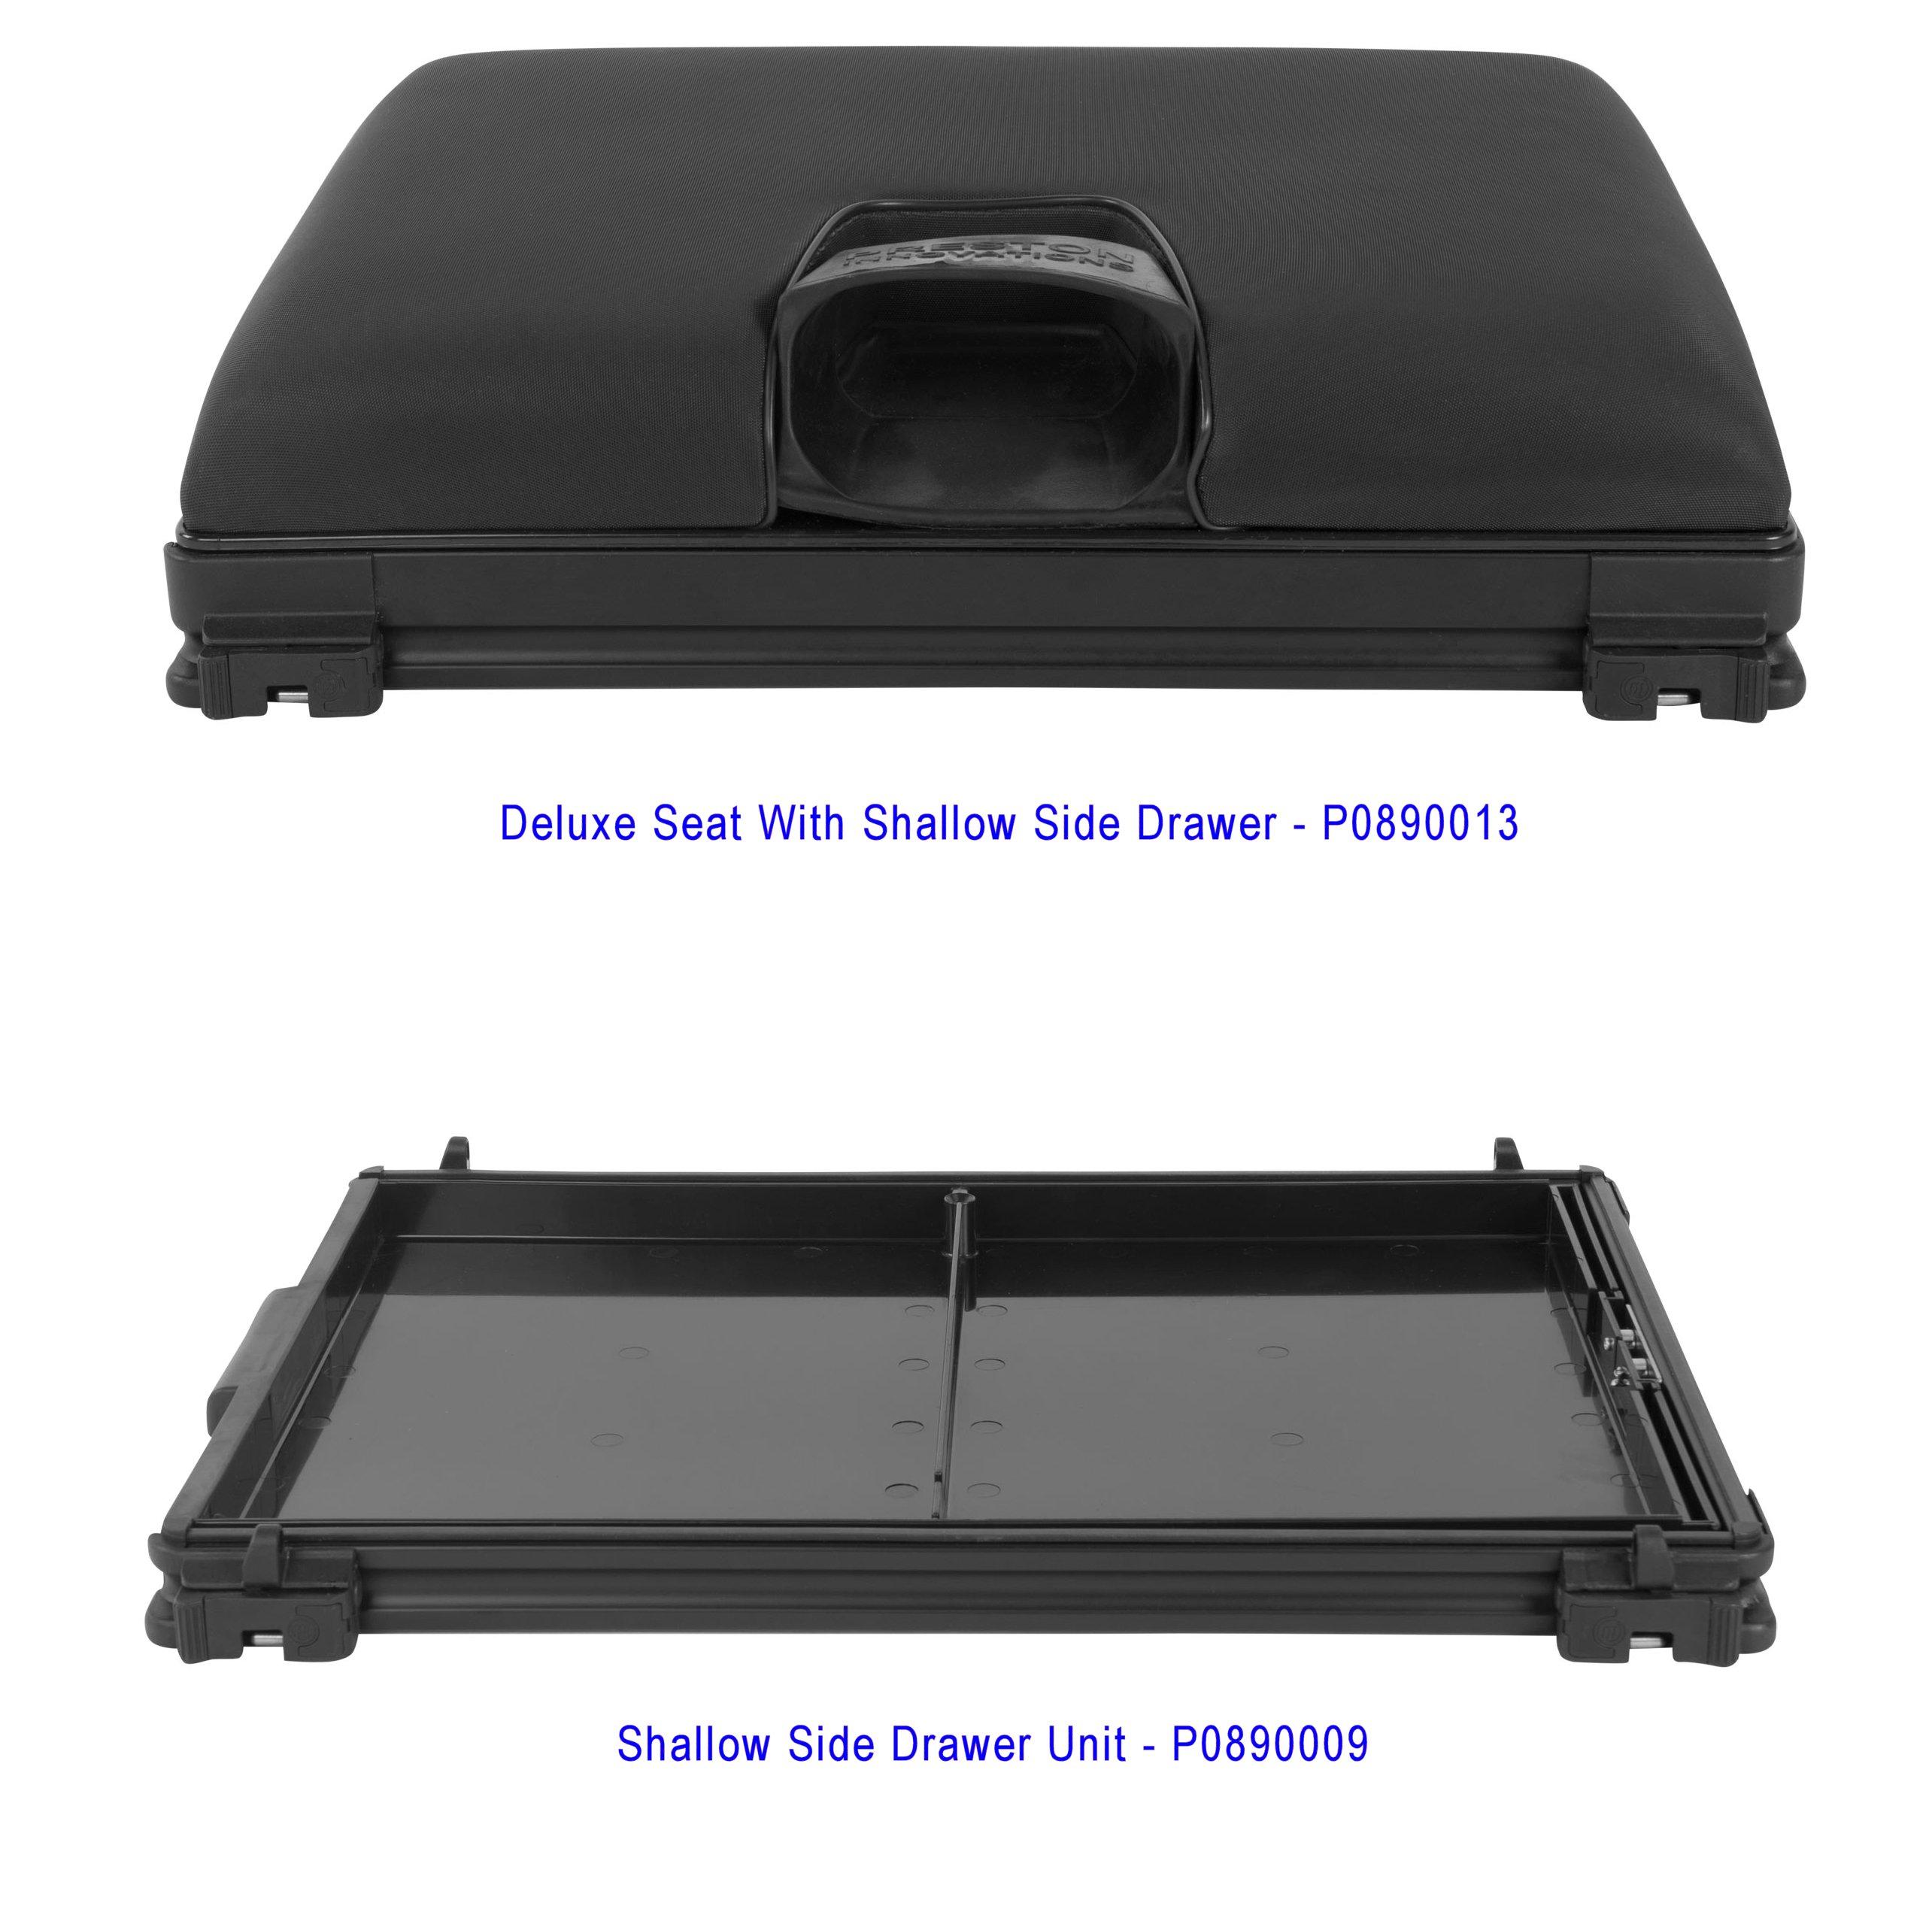 Preston Innovations Absolute Mag Lok Trays & Units - Buy Online